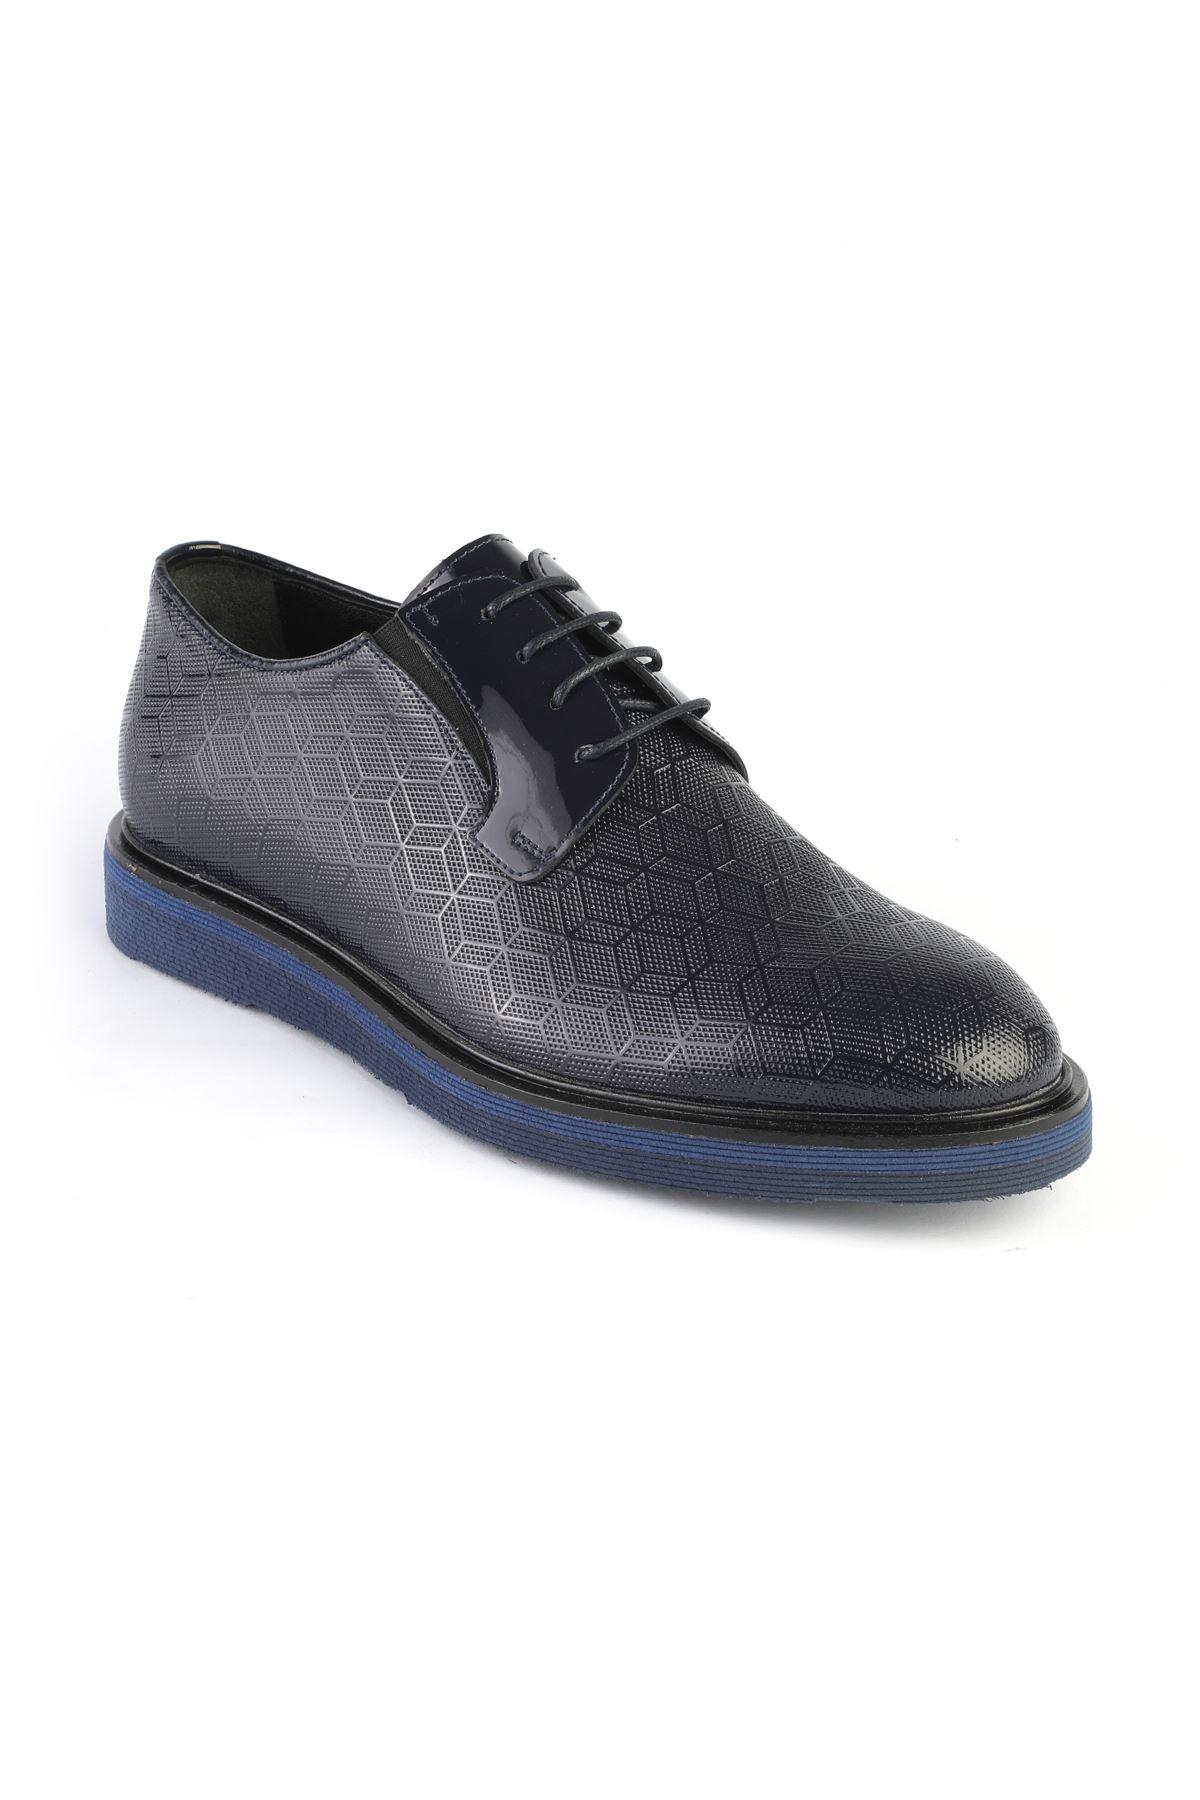 Libero 3234 Navy Blue Oxford Shoes